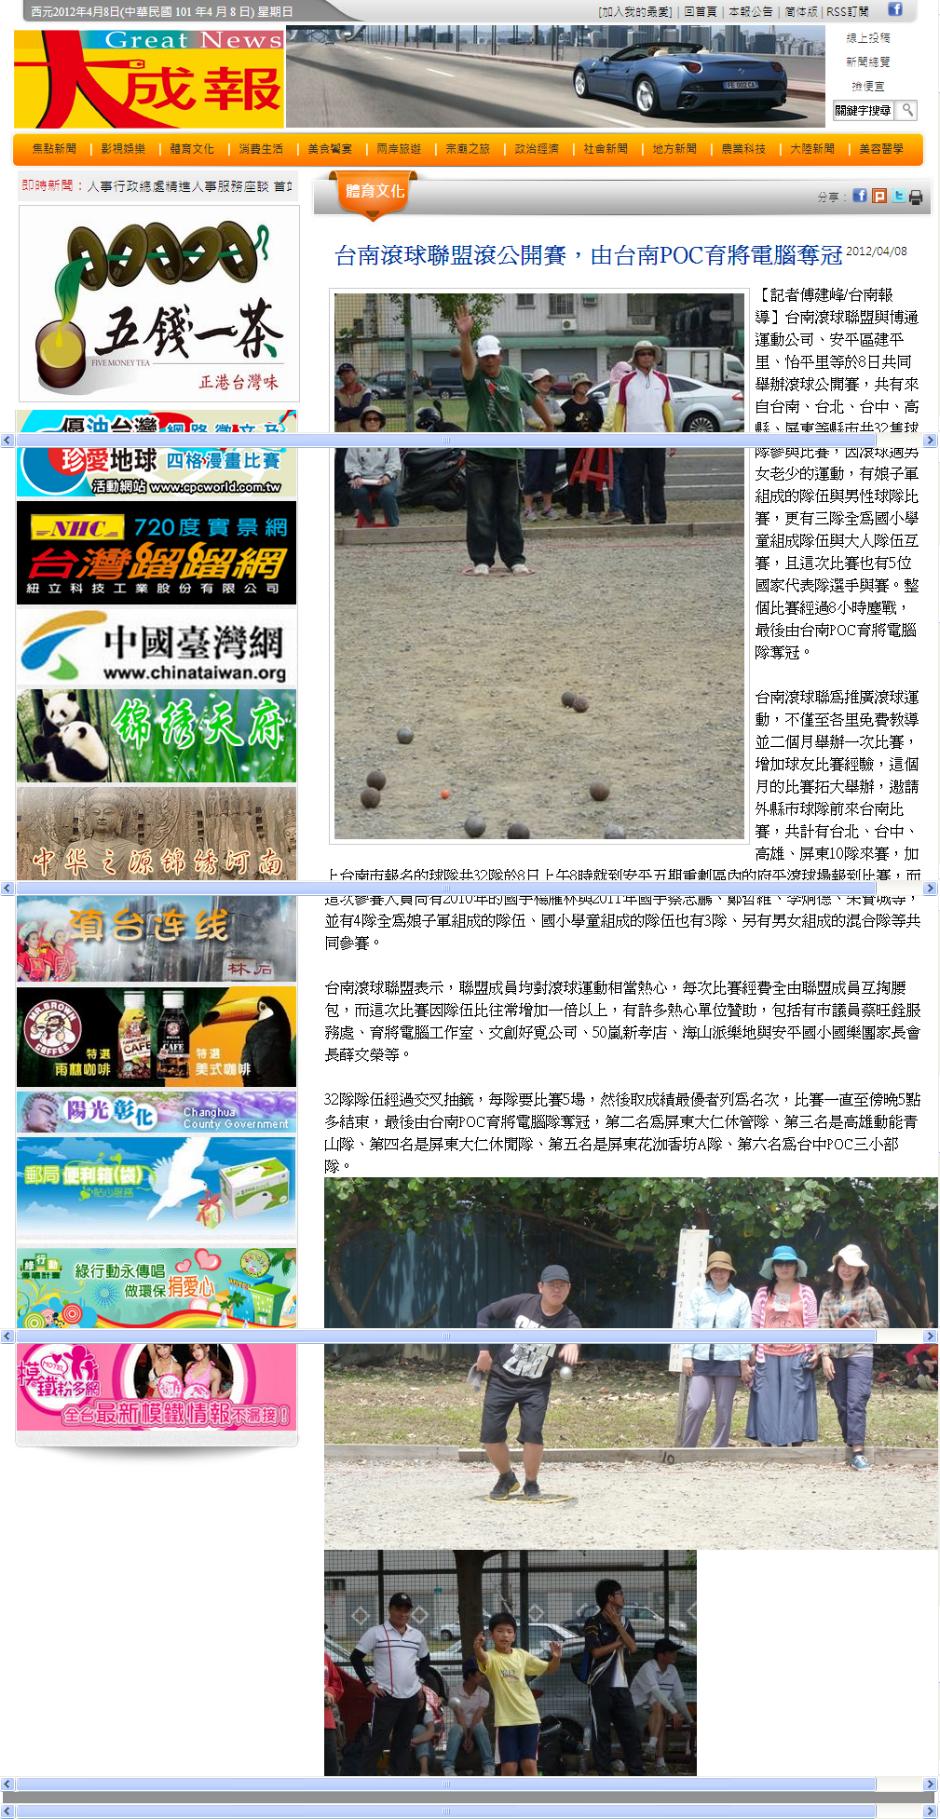 2012 POC-台南滾球聯盟 滾球公開賽:::大成報新聞:::